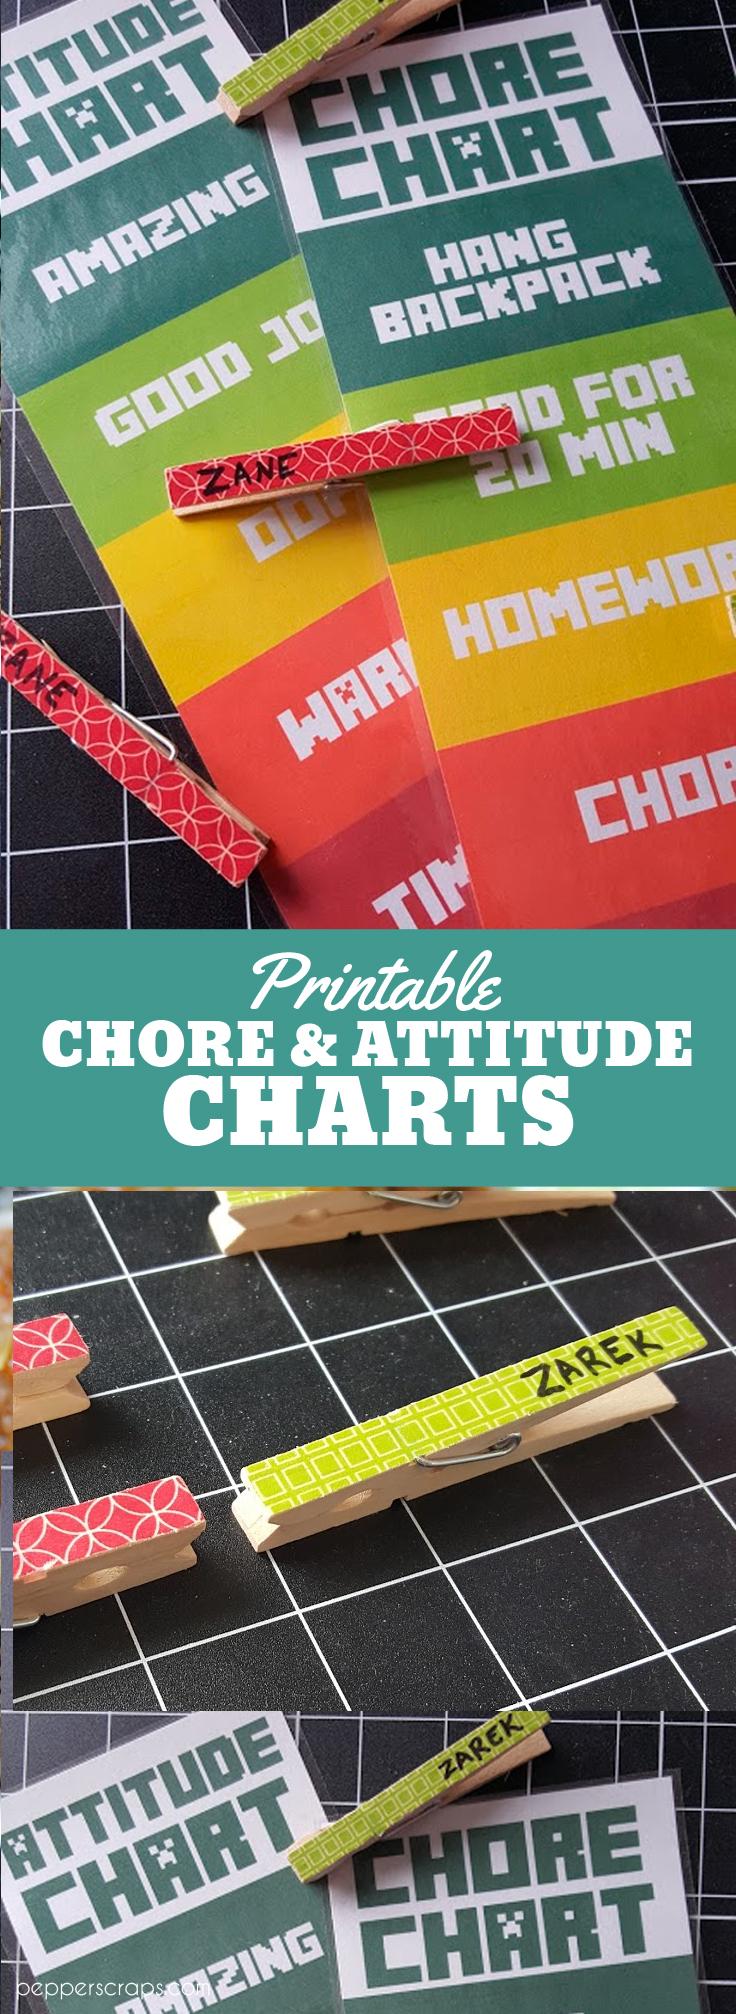 Printable Chore Charts and Attititude Charts with Washi Clothes Pins